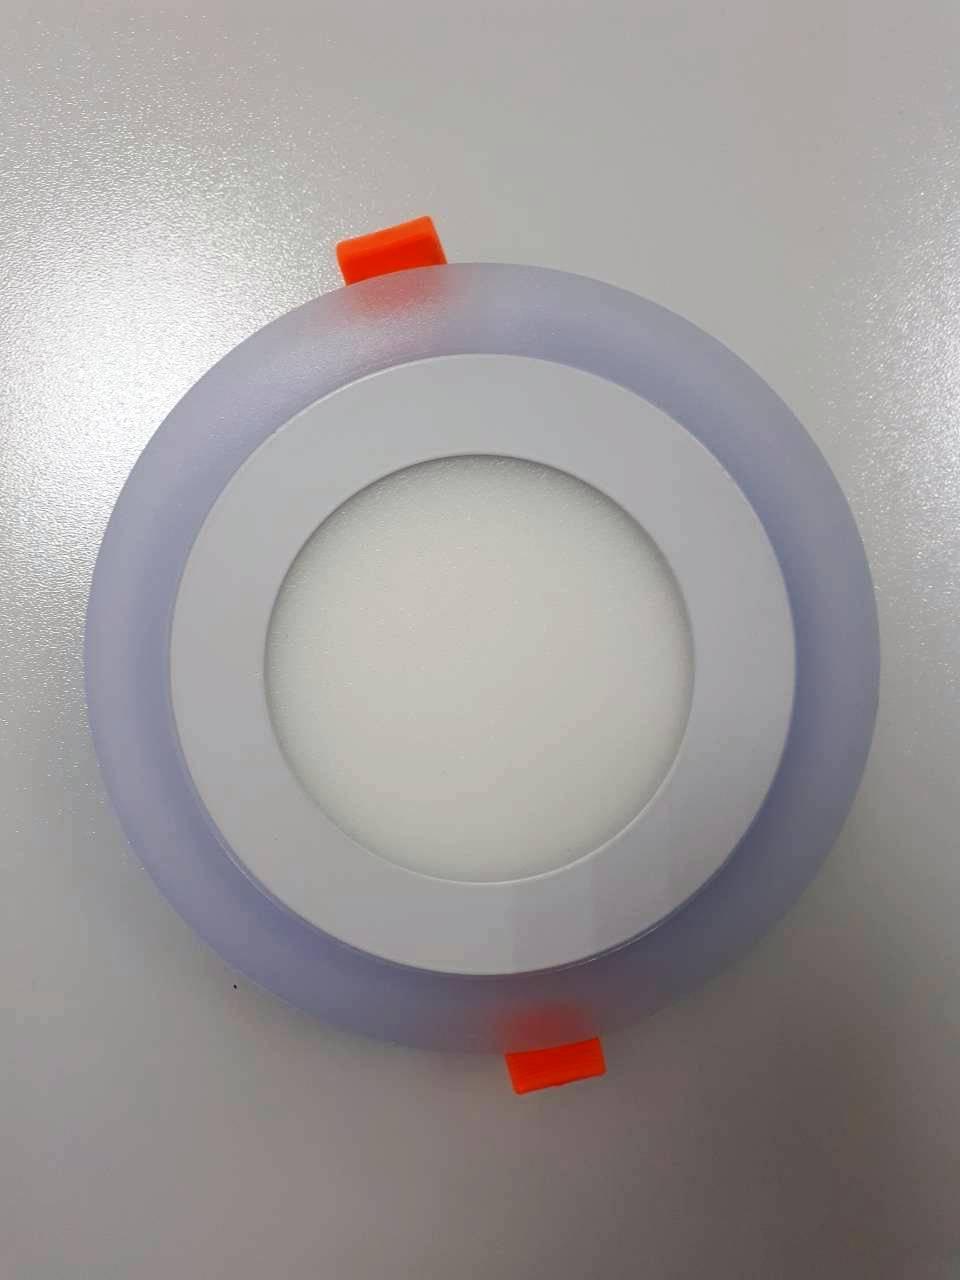 LED панель Lemanso 6+3W  с синей посведкой 4500K круг / LM496